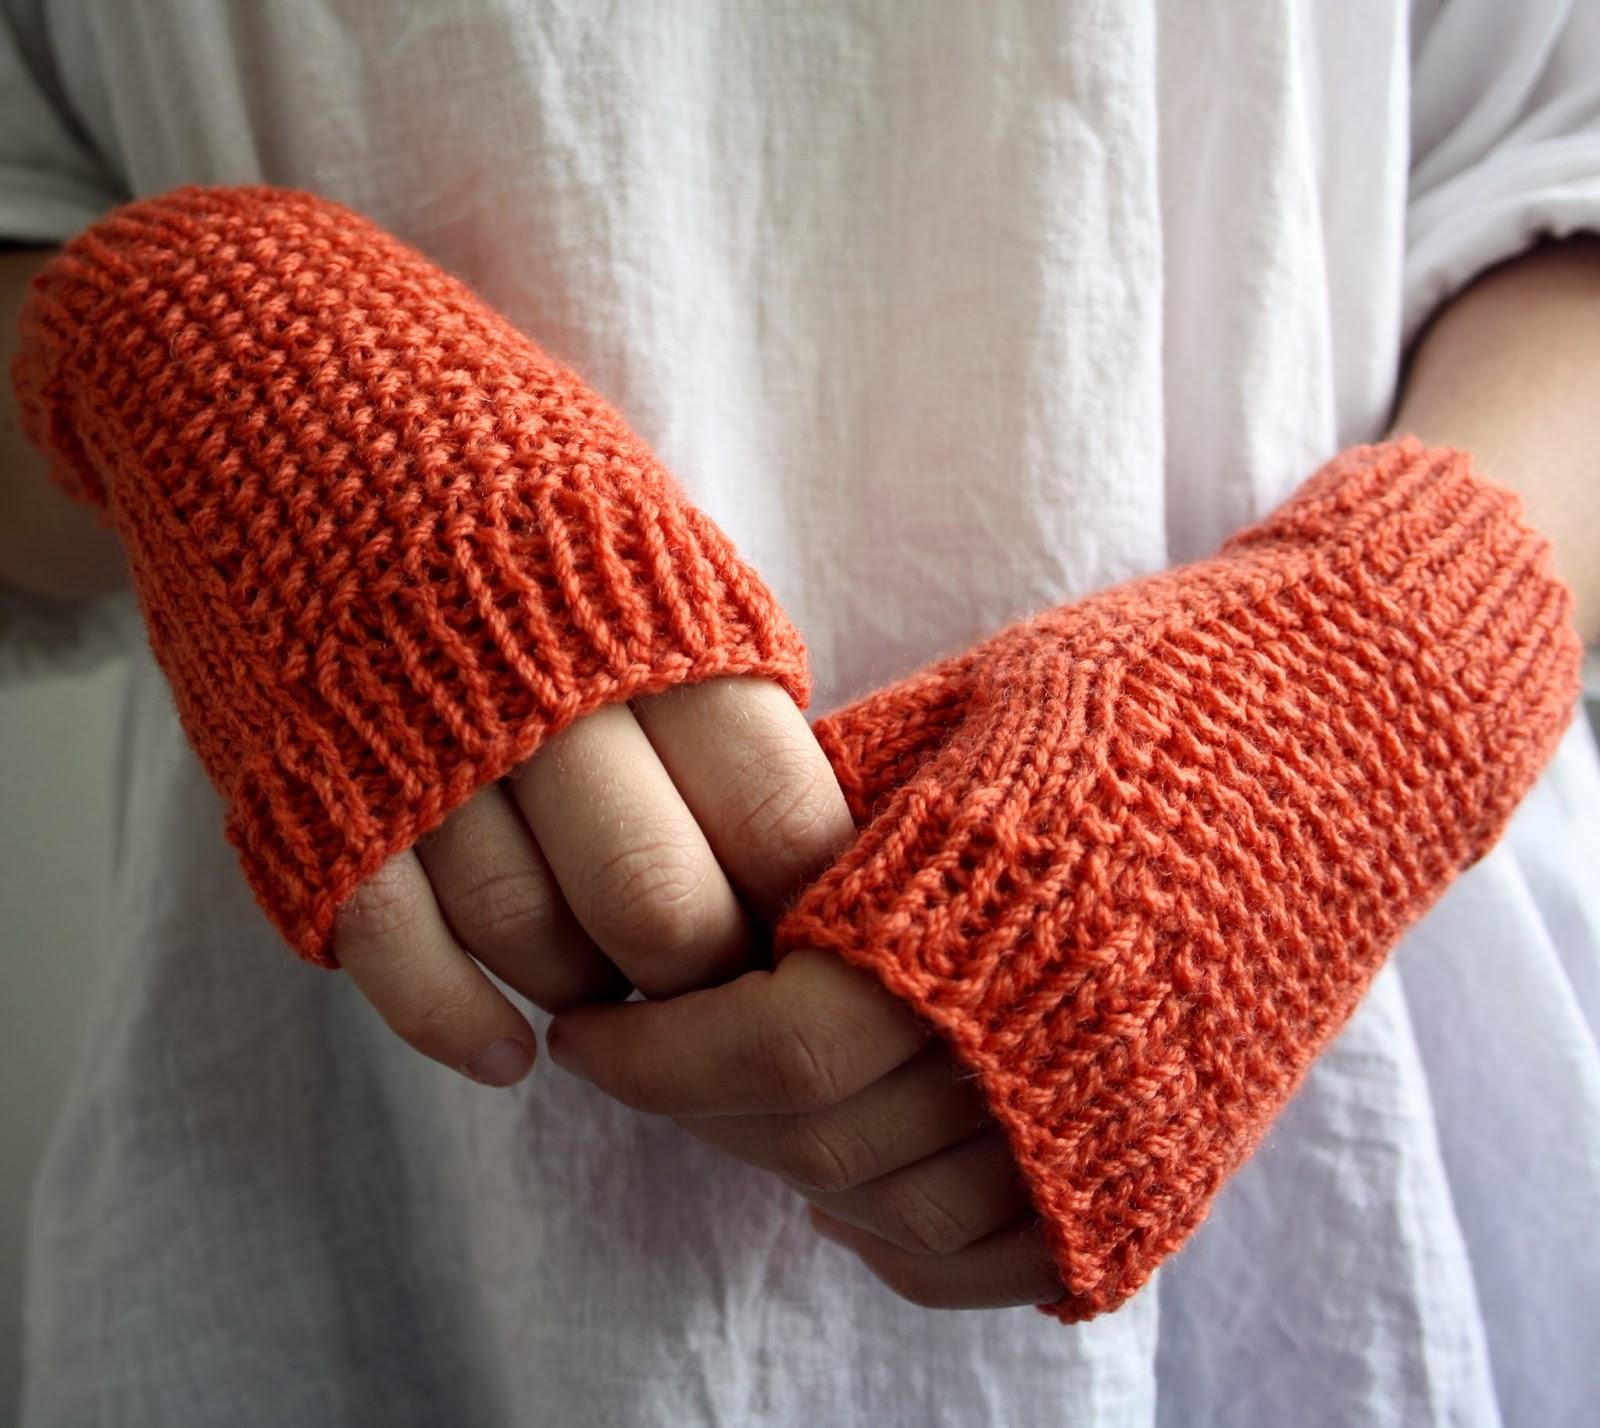 https://www.etsy.com/au/listing/182119162/wool-fingerless-gloves-handknit-in?ref=shop_home_active_1